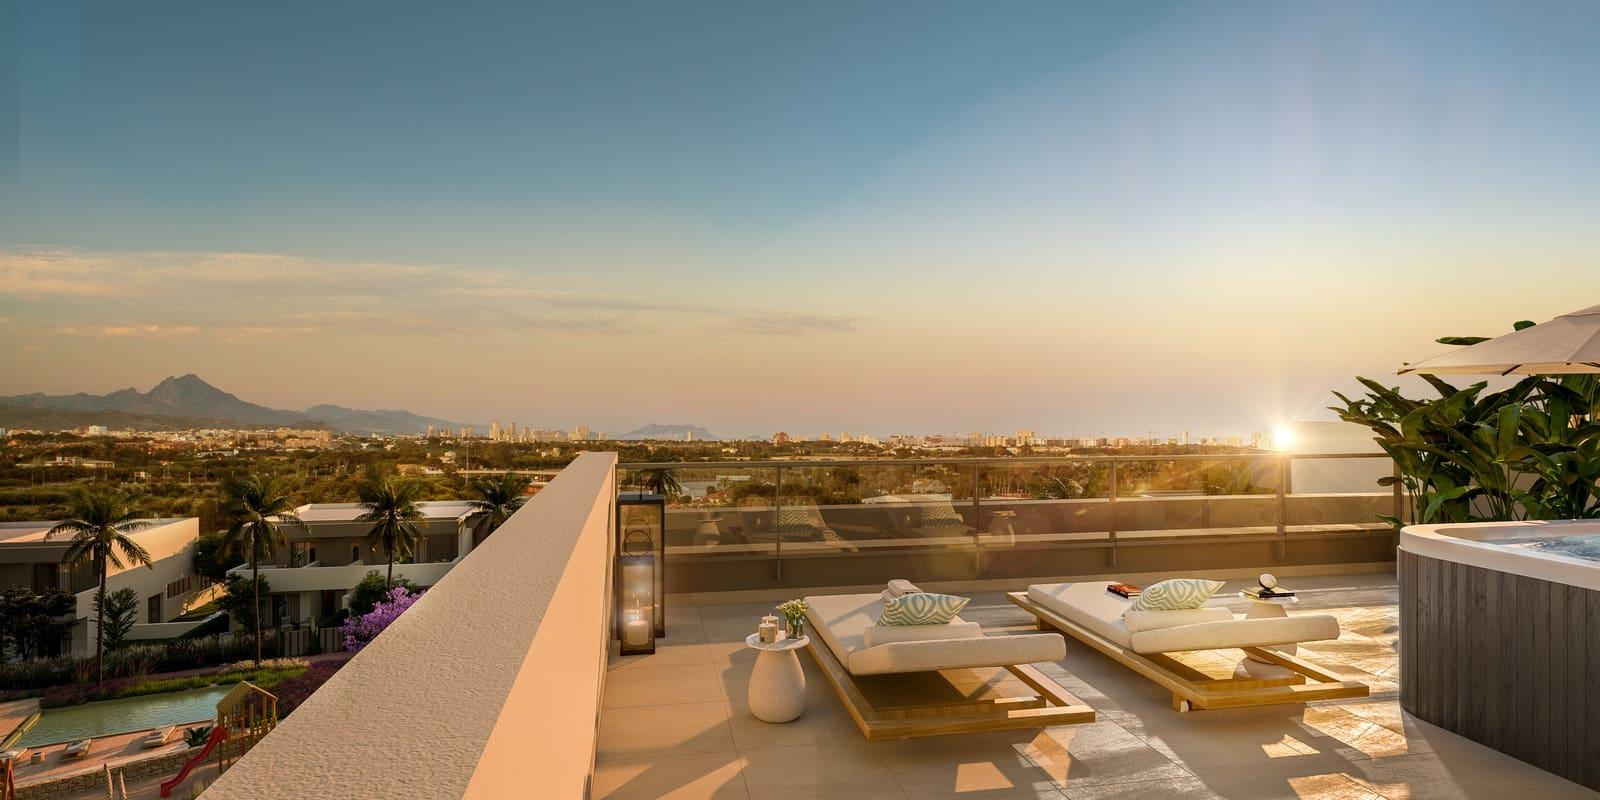 5 bedroom Semi-detached Villa for sale in Alicante / Alacant city with pool - € 545,000 (Ref: 5931051)